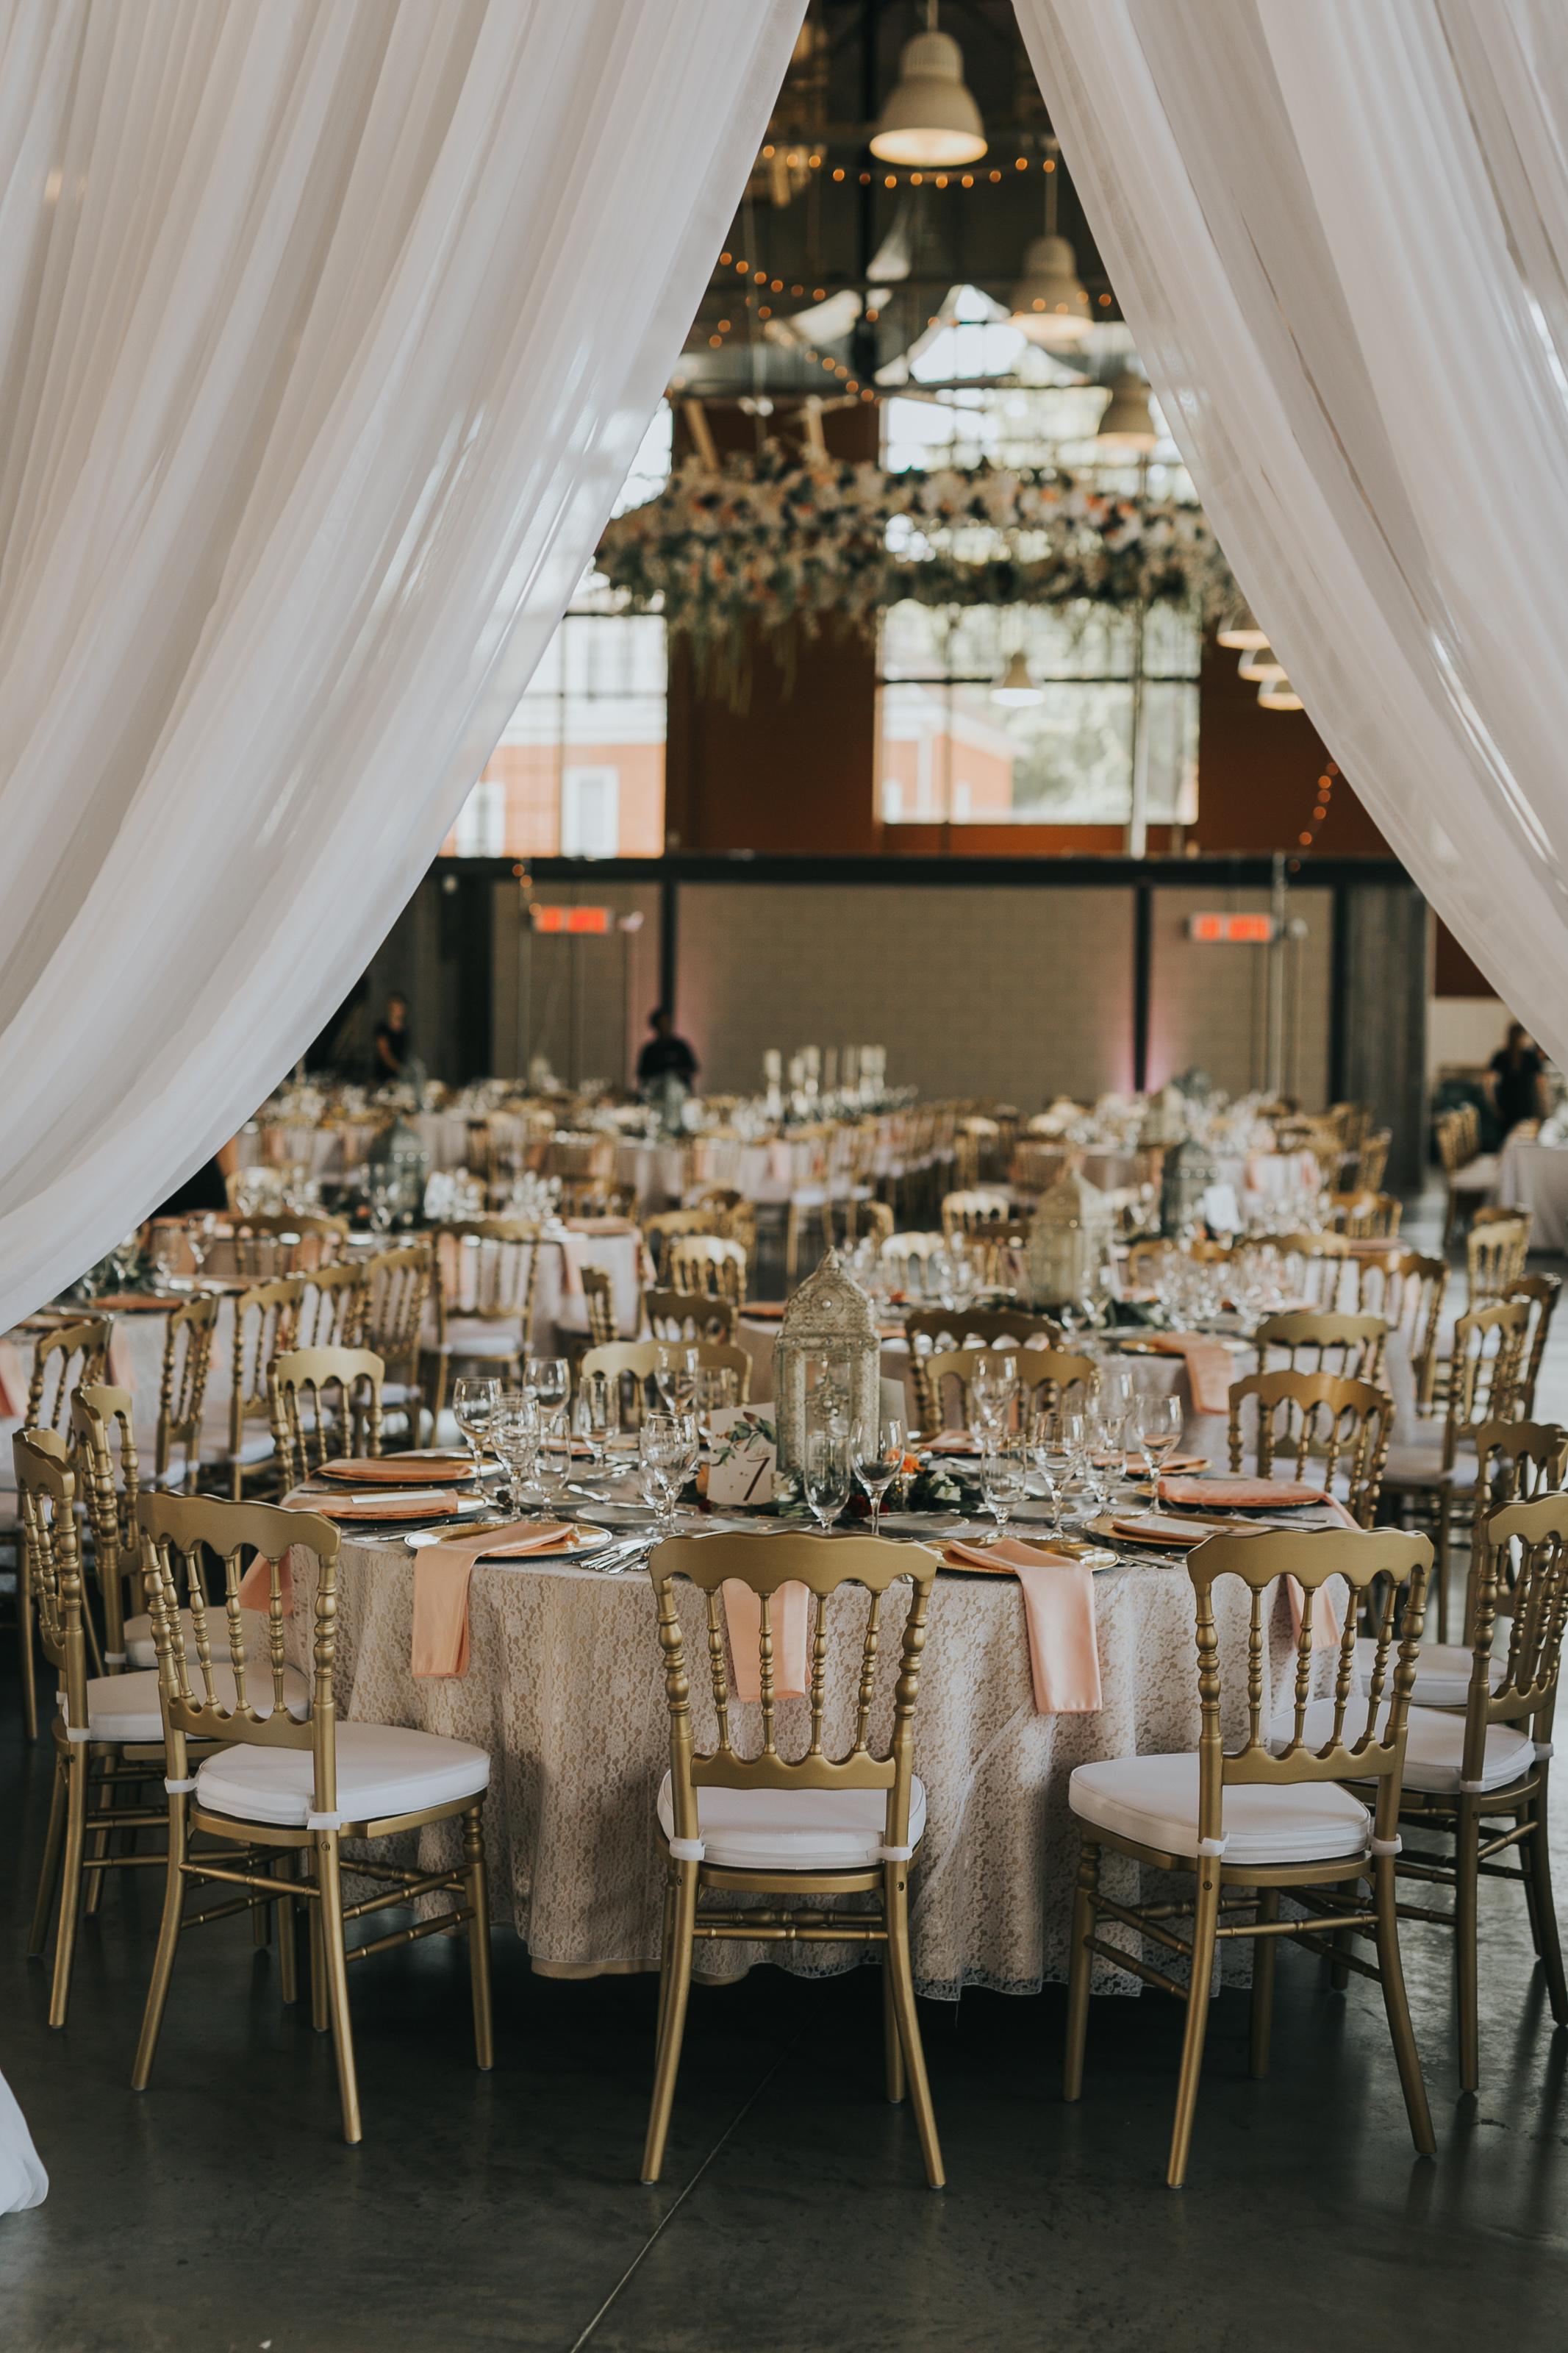 chair covers rental ottawa patio with nesting ottoman canada gold napoleon chiavari chairs  pearl decor